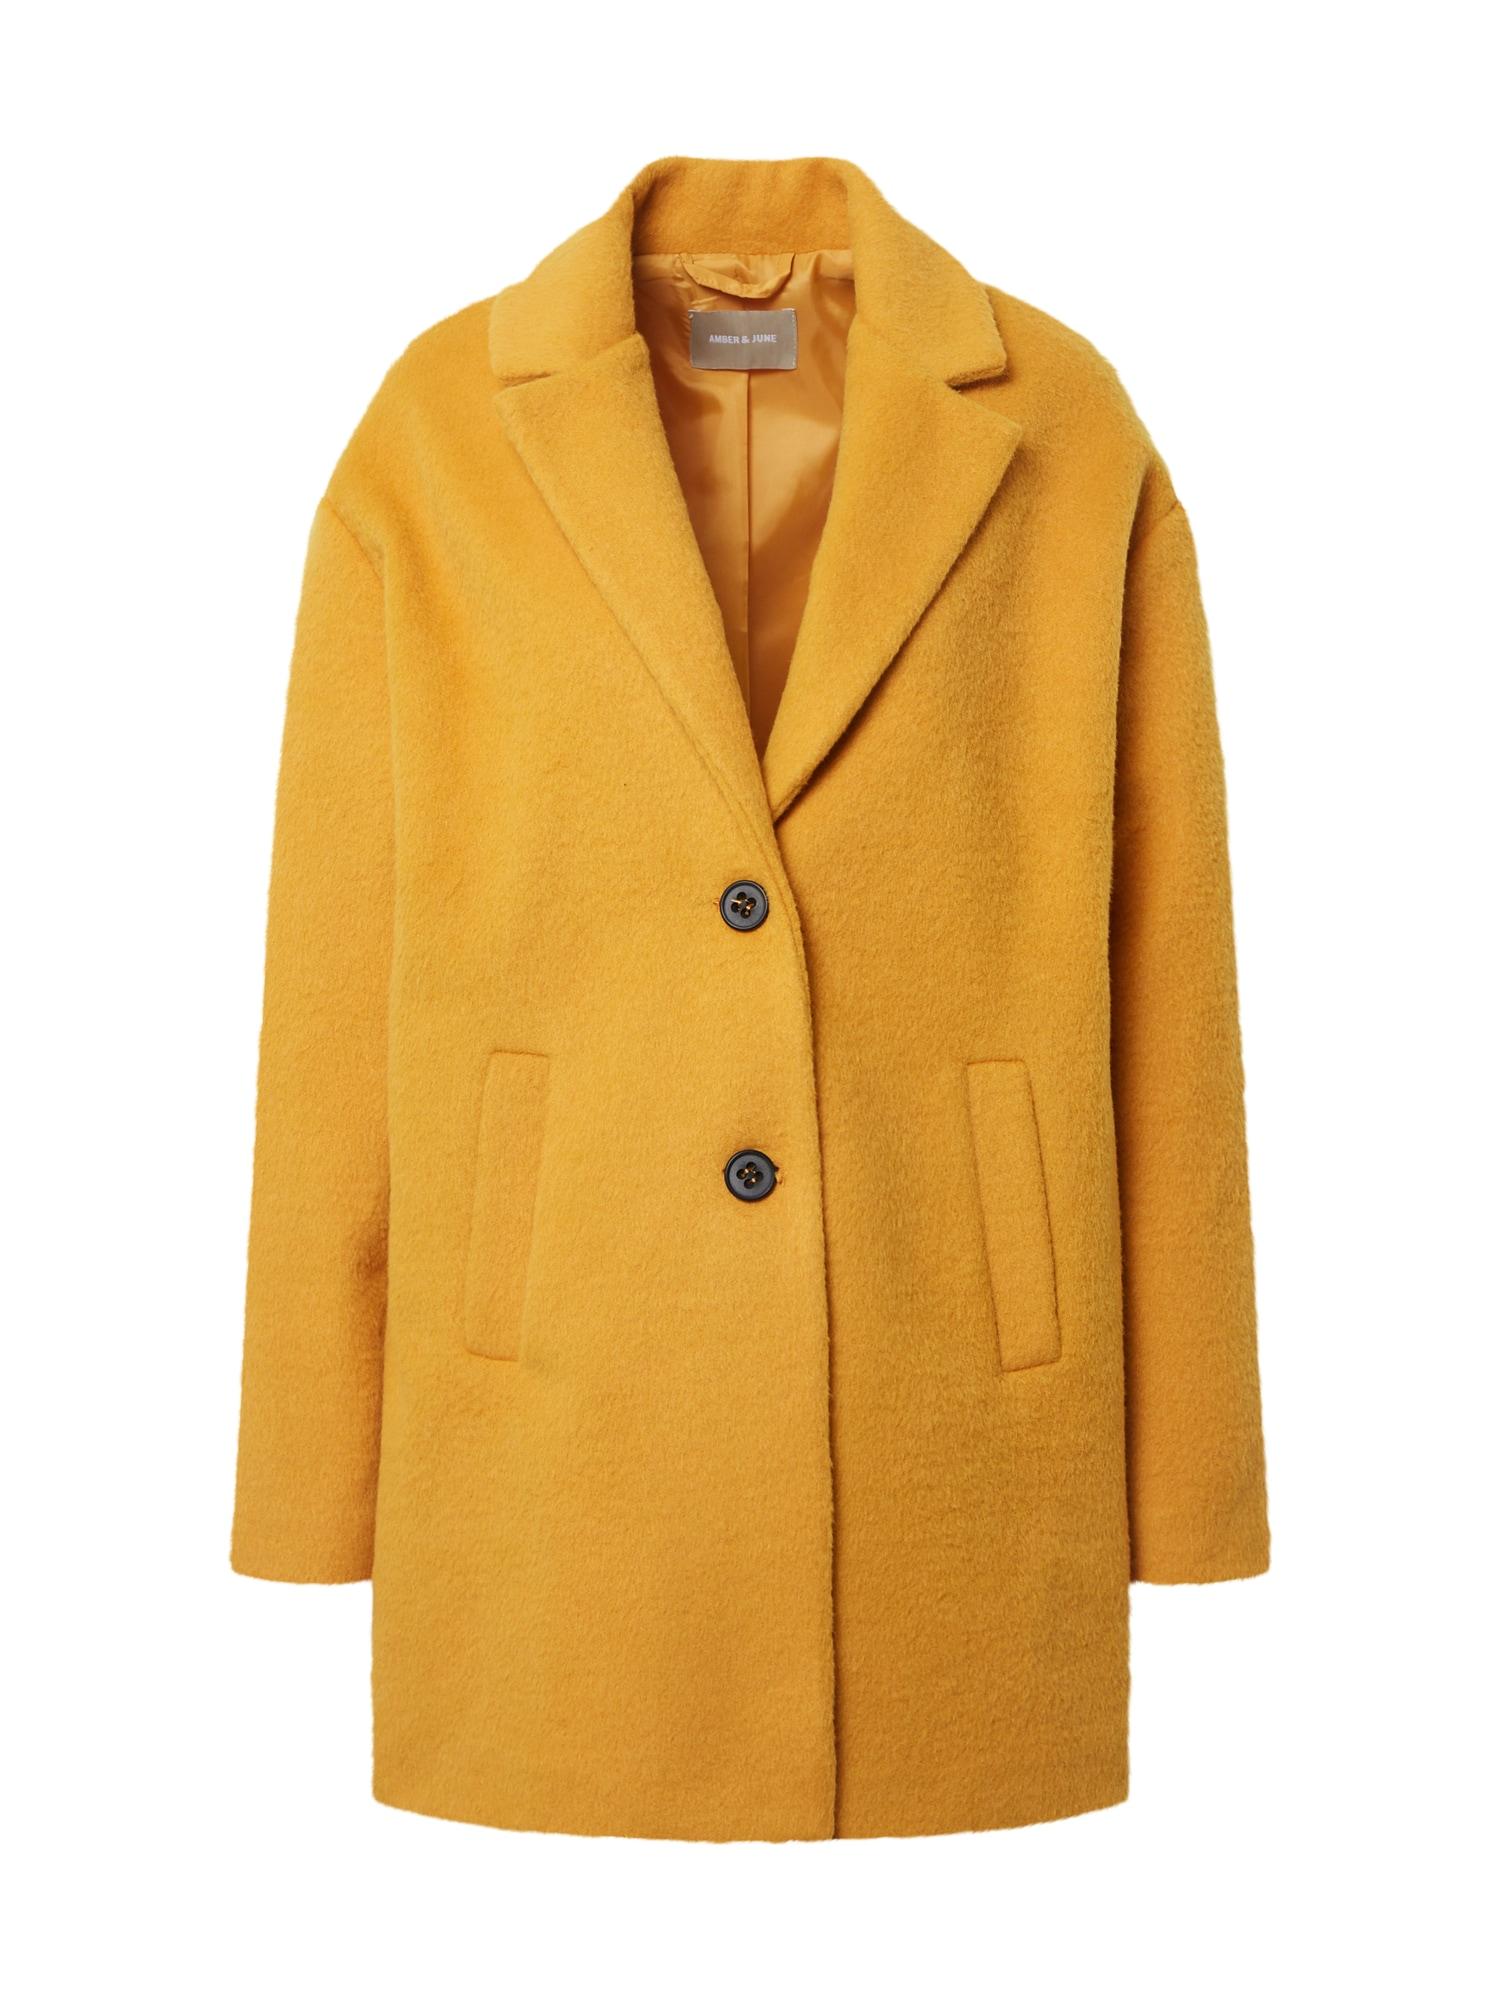 Amber & June Demisezoninis paltas geltona